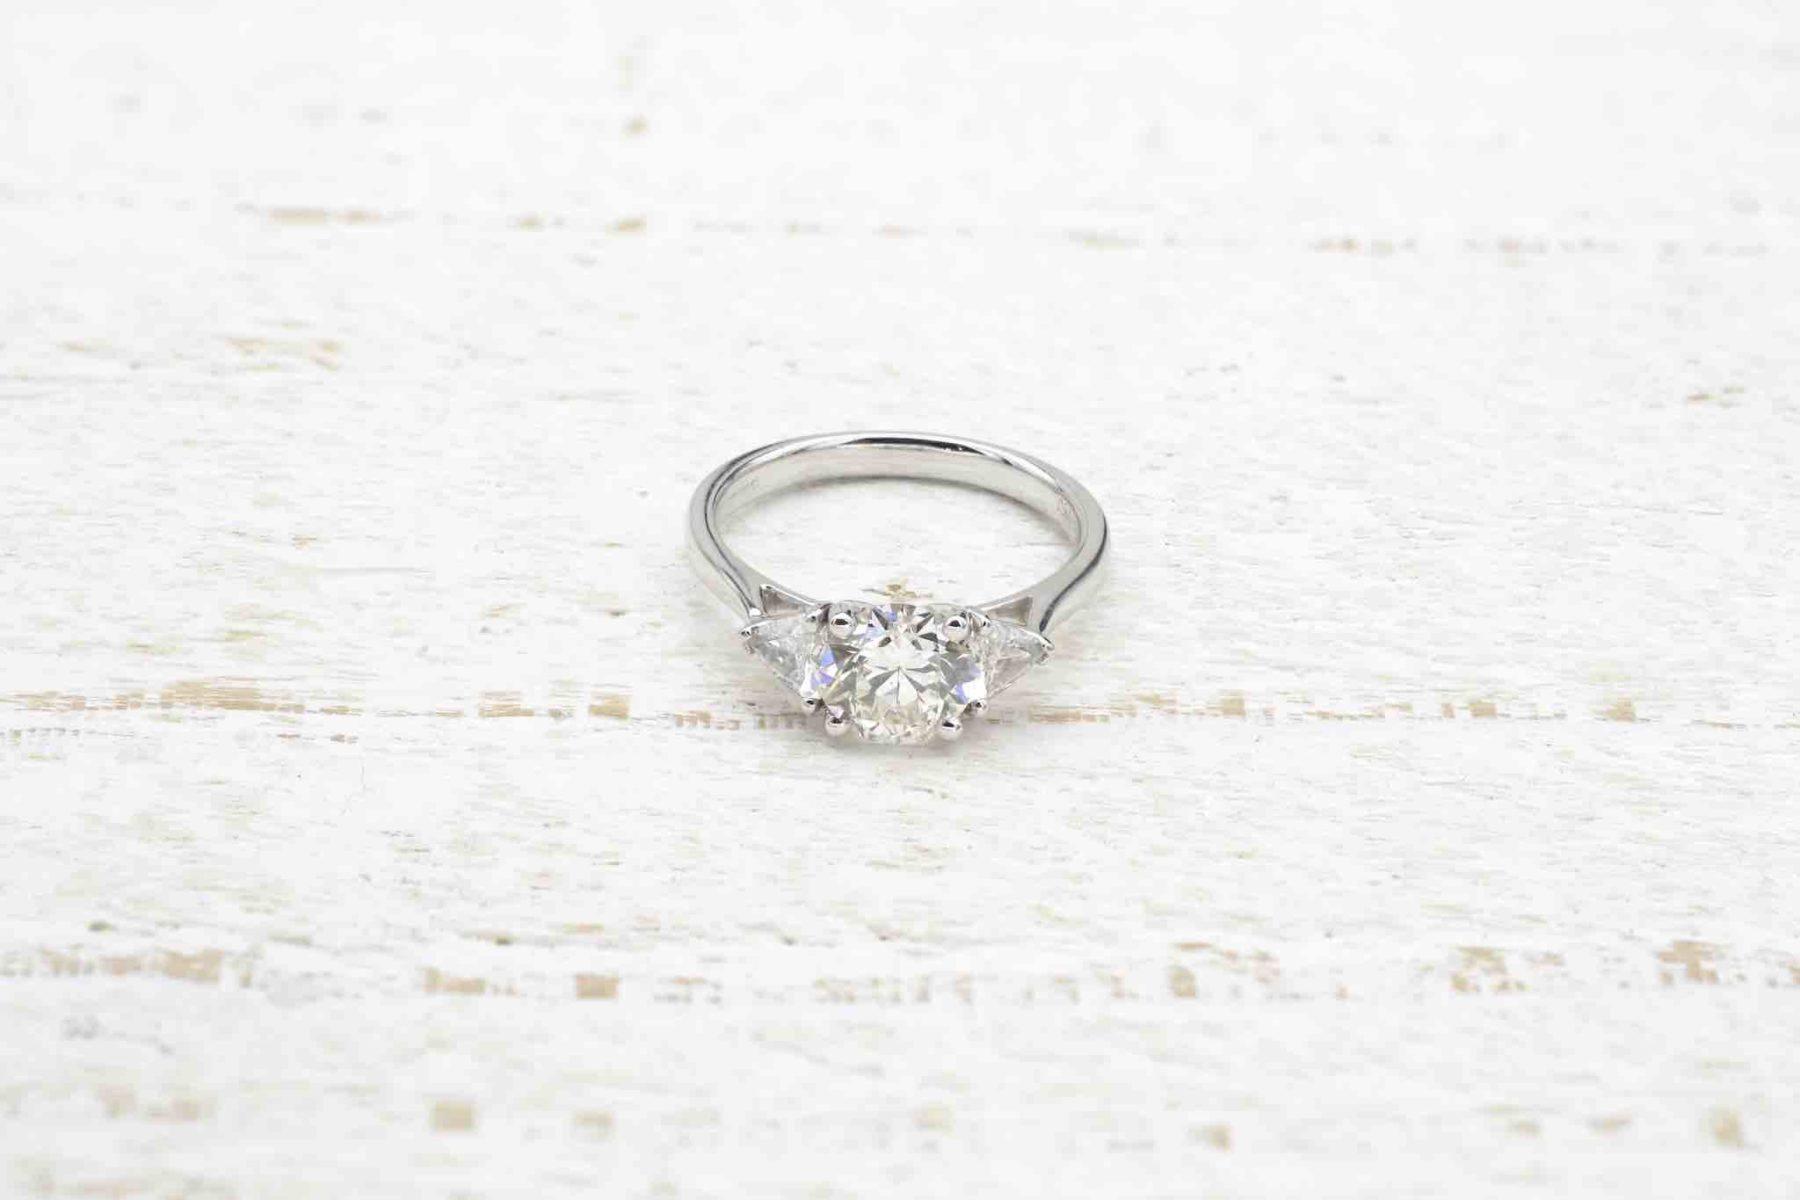 Bague diamant de 1,26 carats et triangles